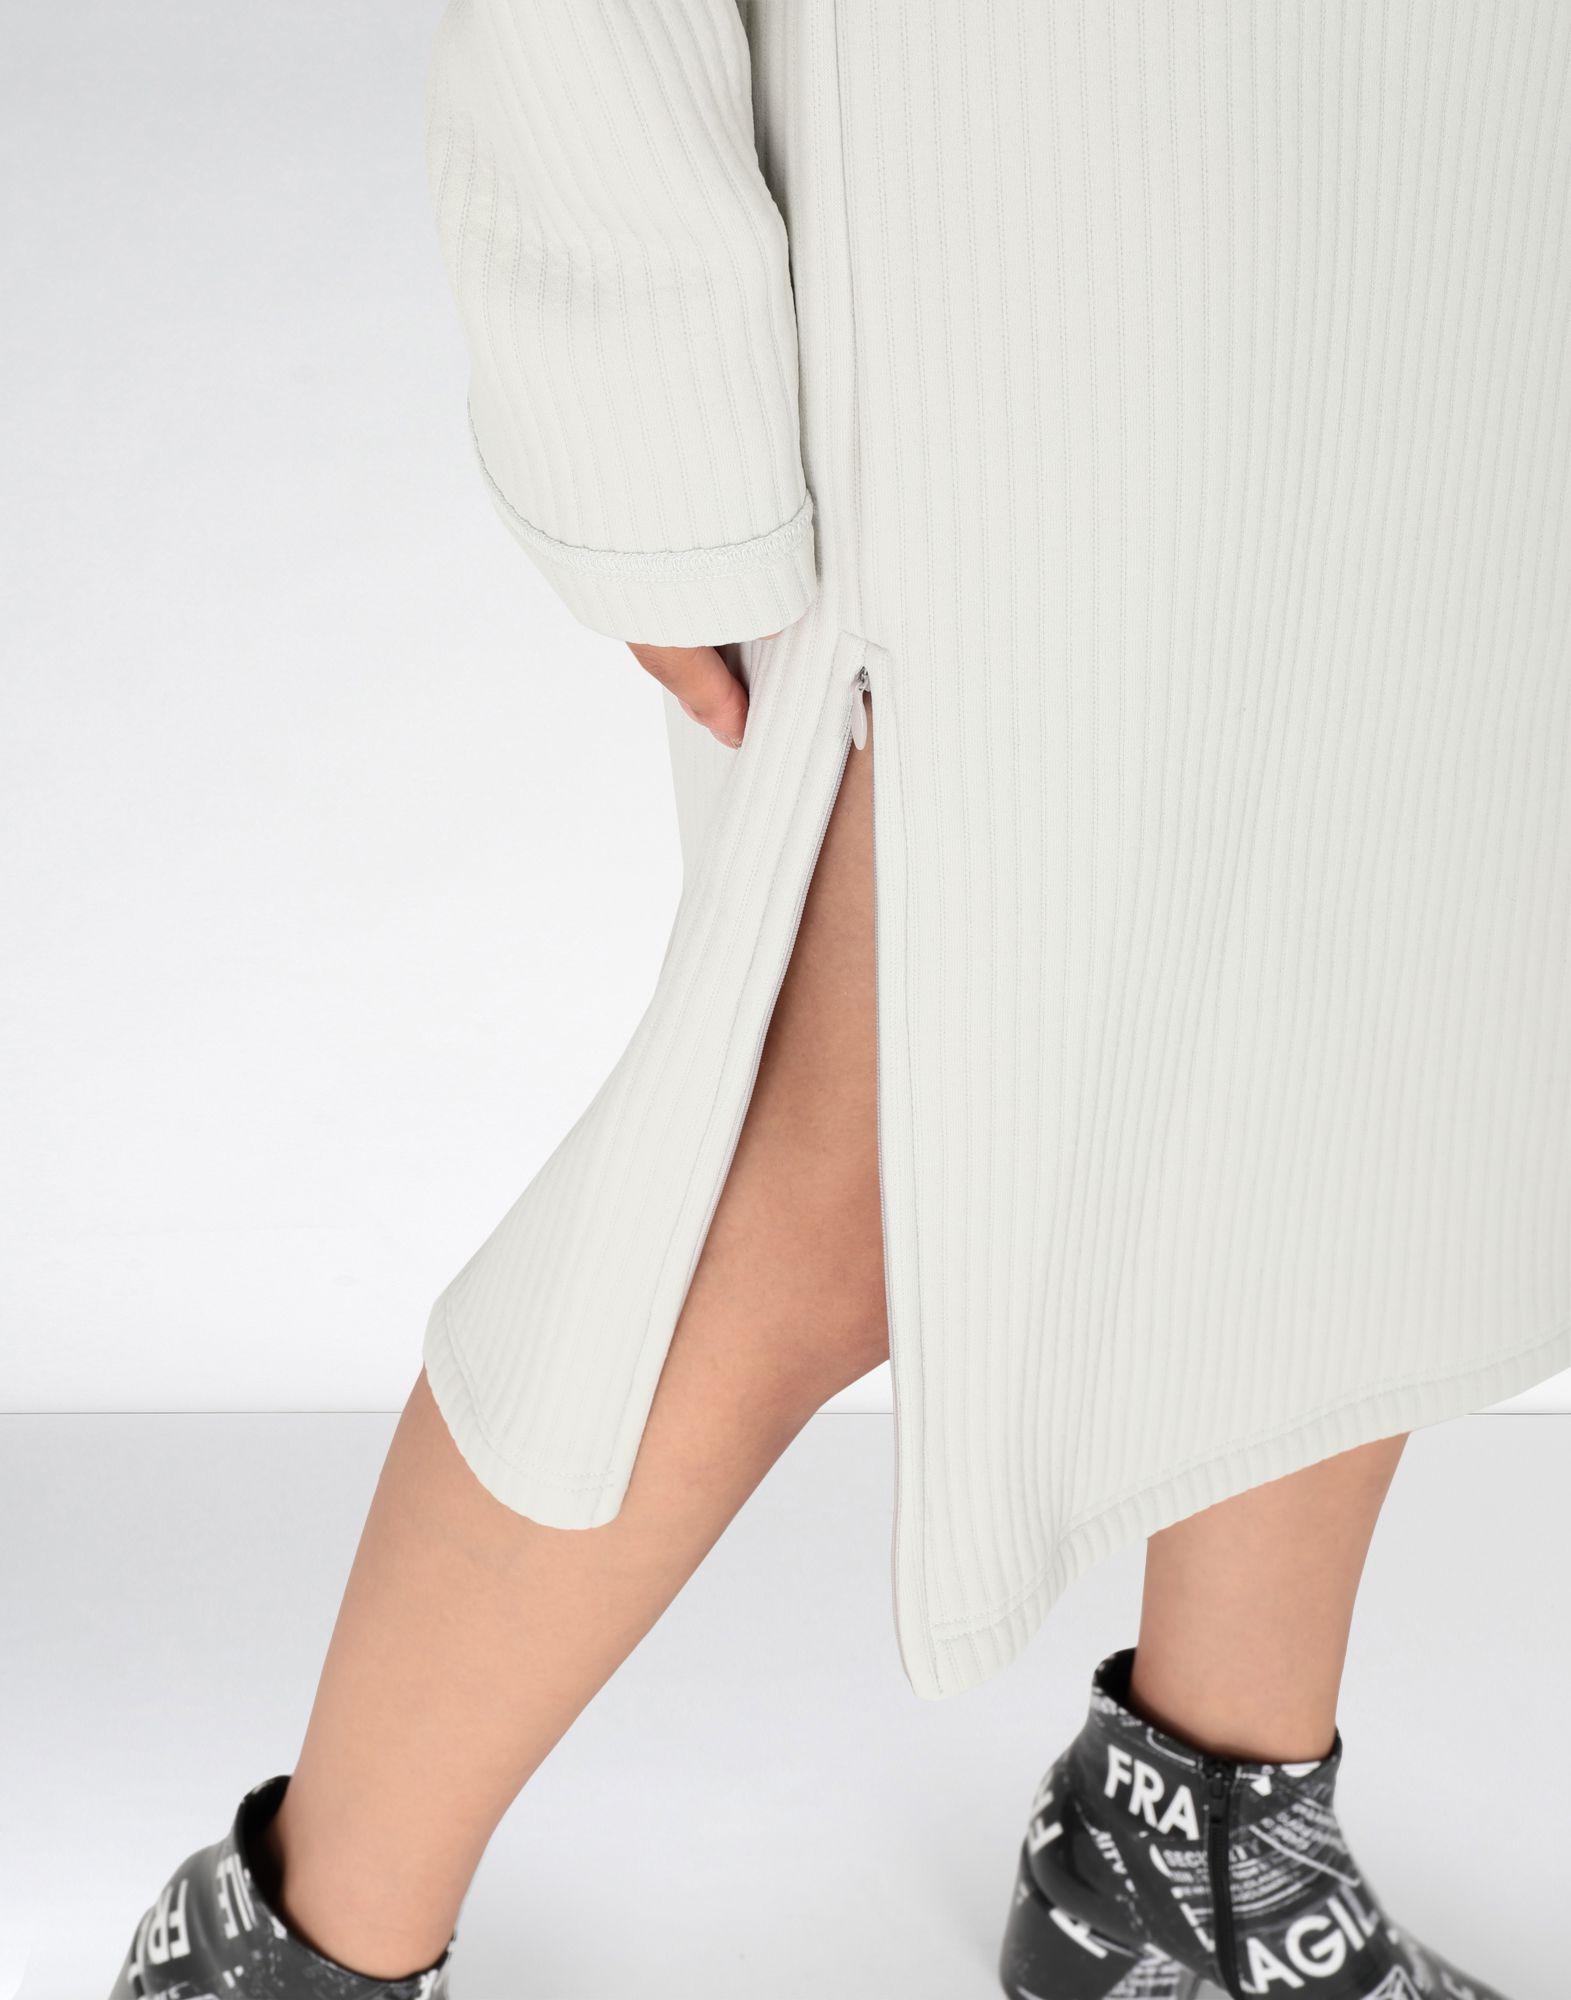 MM6 MAISON MARGIELA Ribbed jersey dress 3/4 length dress Woman a